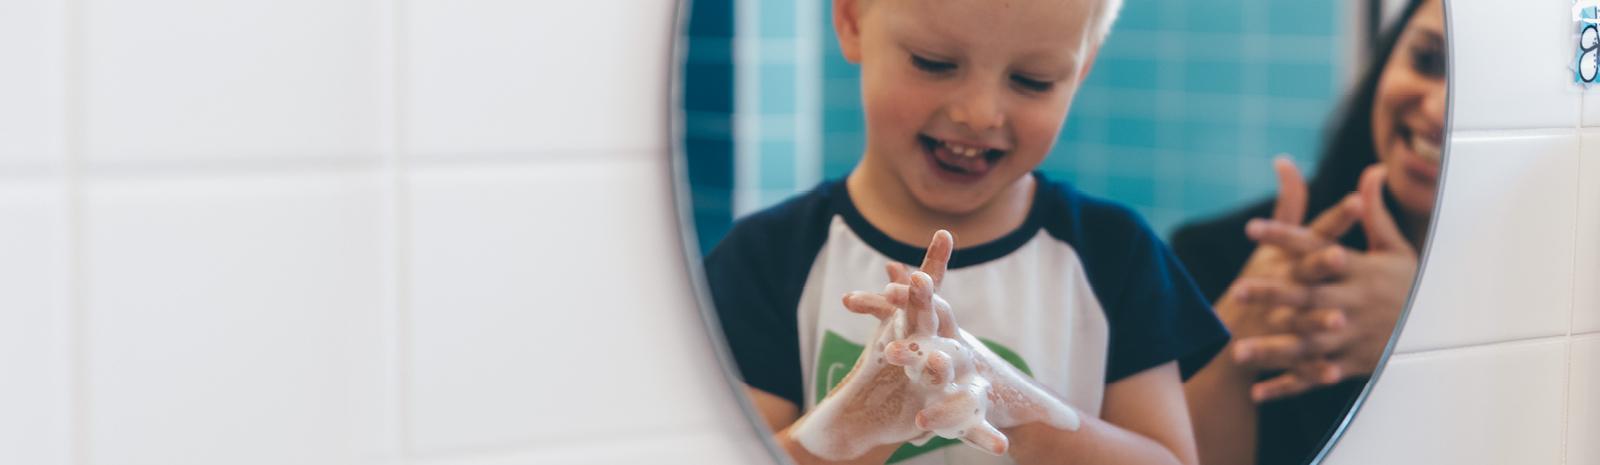 Nurture One Leading Childcare